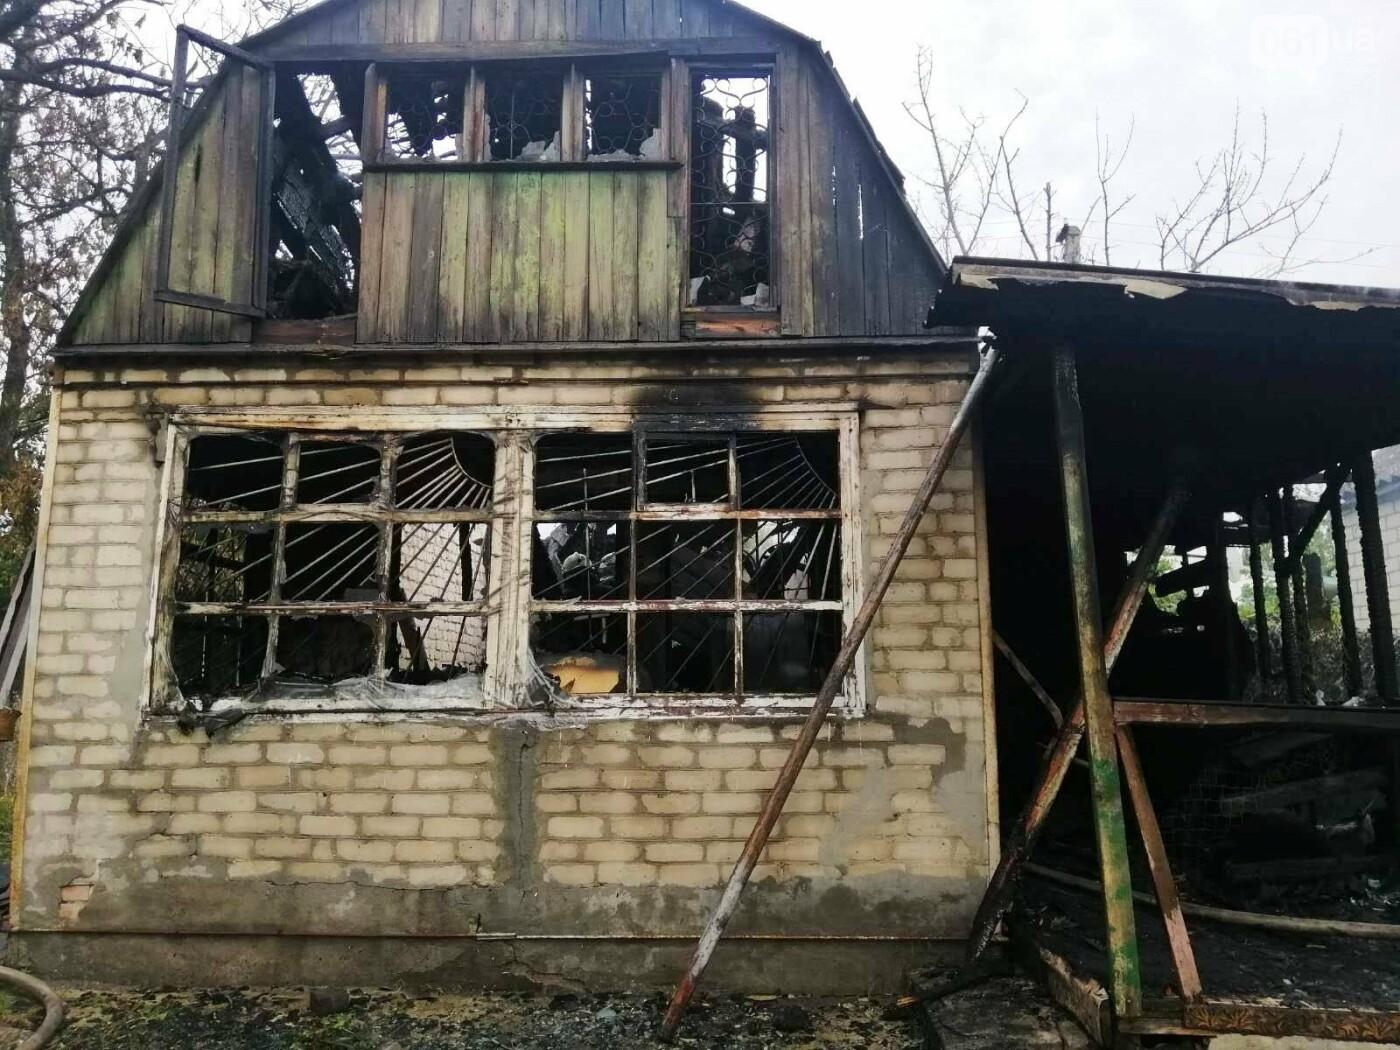 1906810011532971500592874931946172340552095n 60bca178f02ca - В Бердянске 12 спасателей тушили пожар на территории садового товарищества